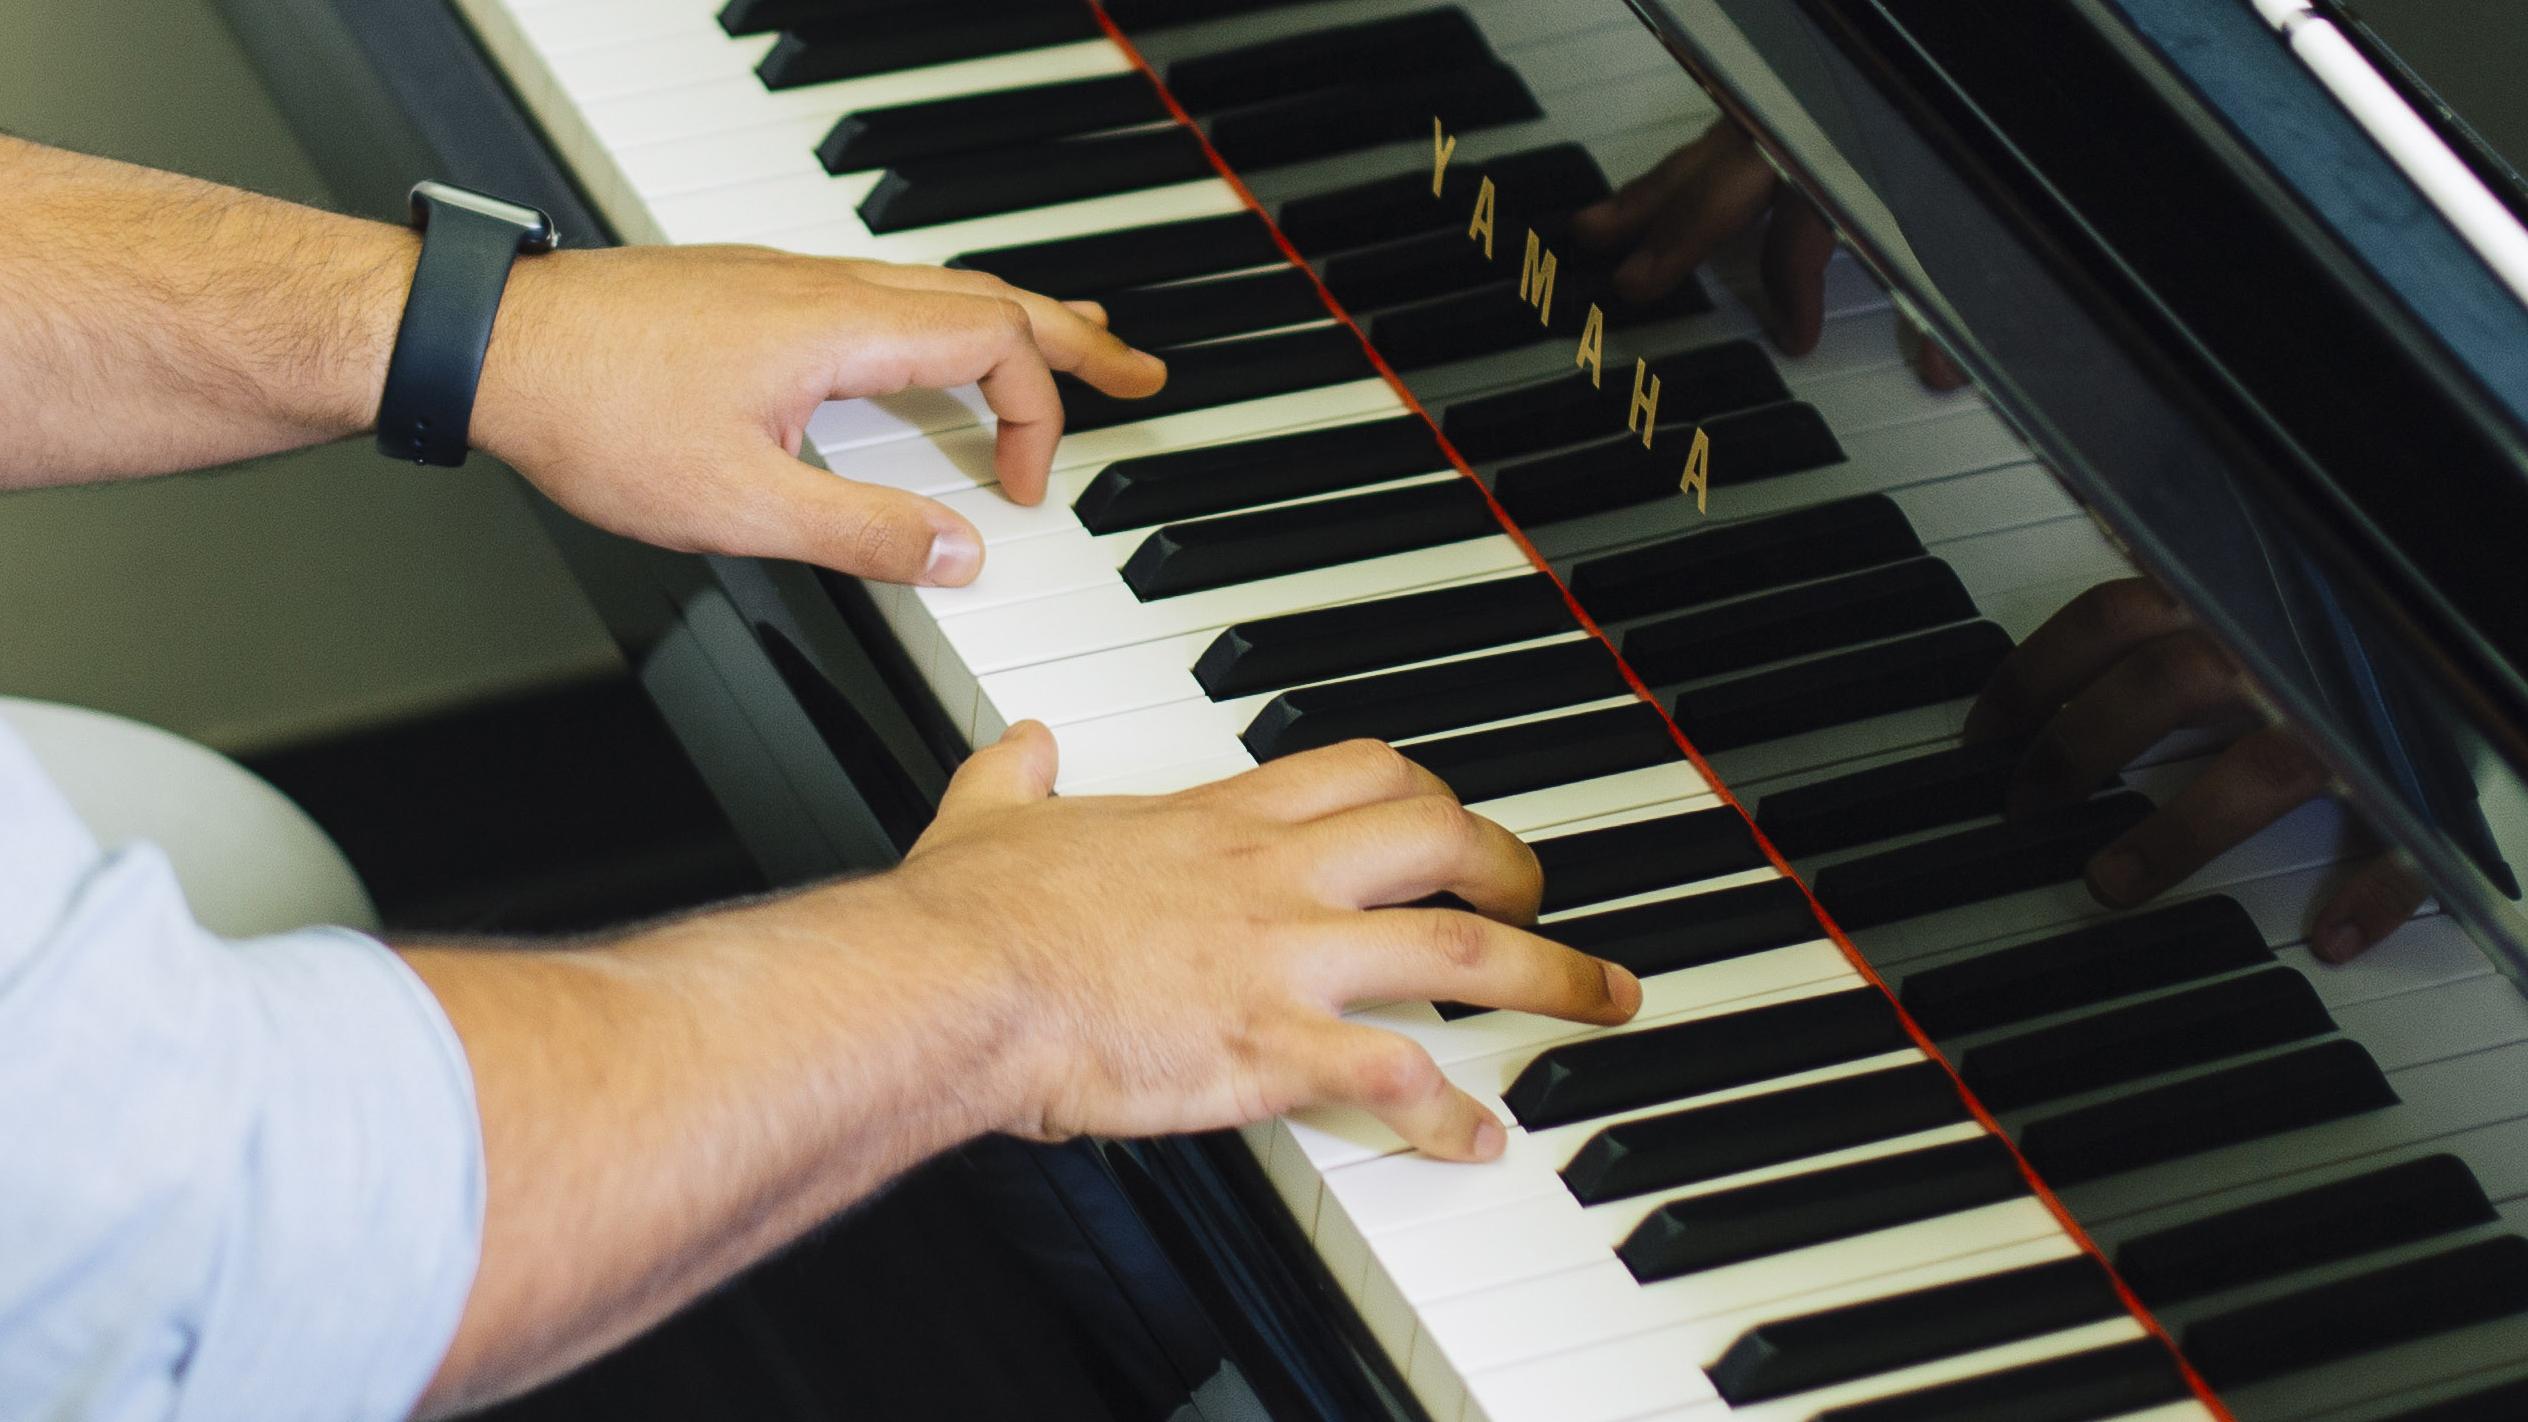 Alfredo plays the piano